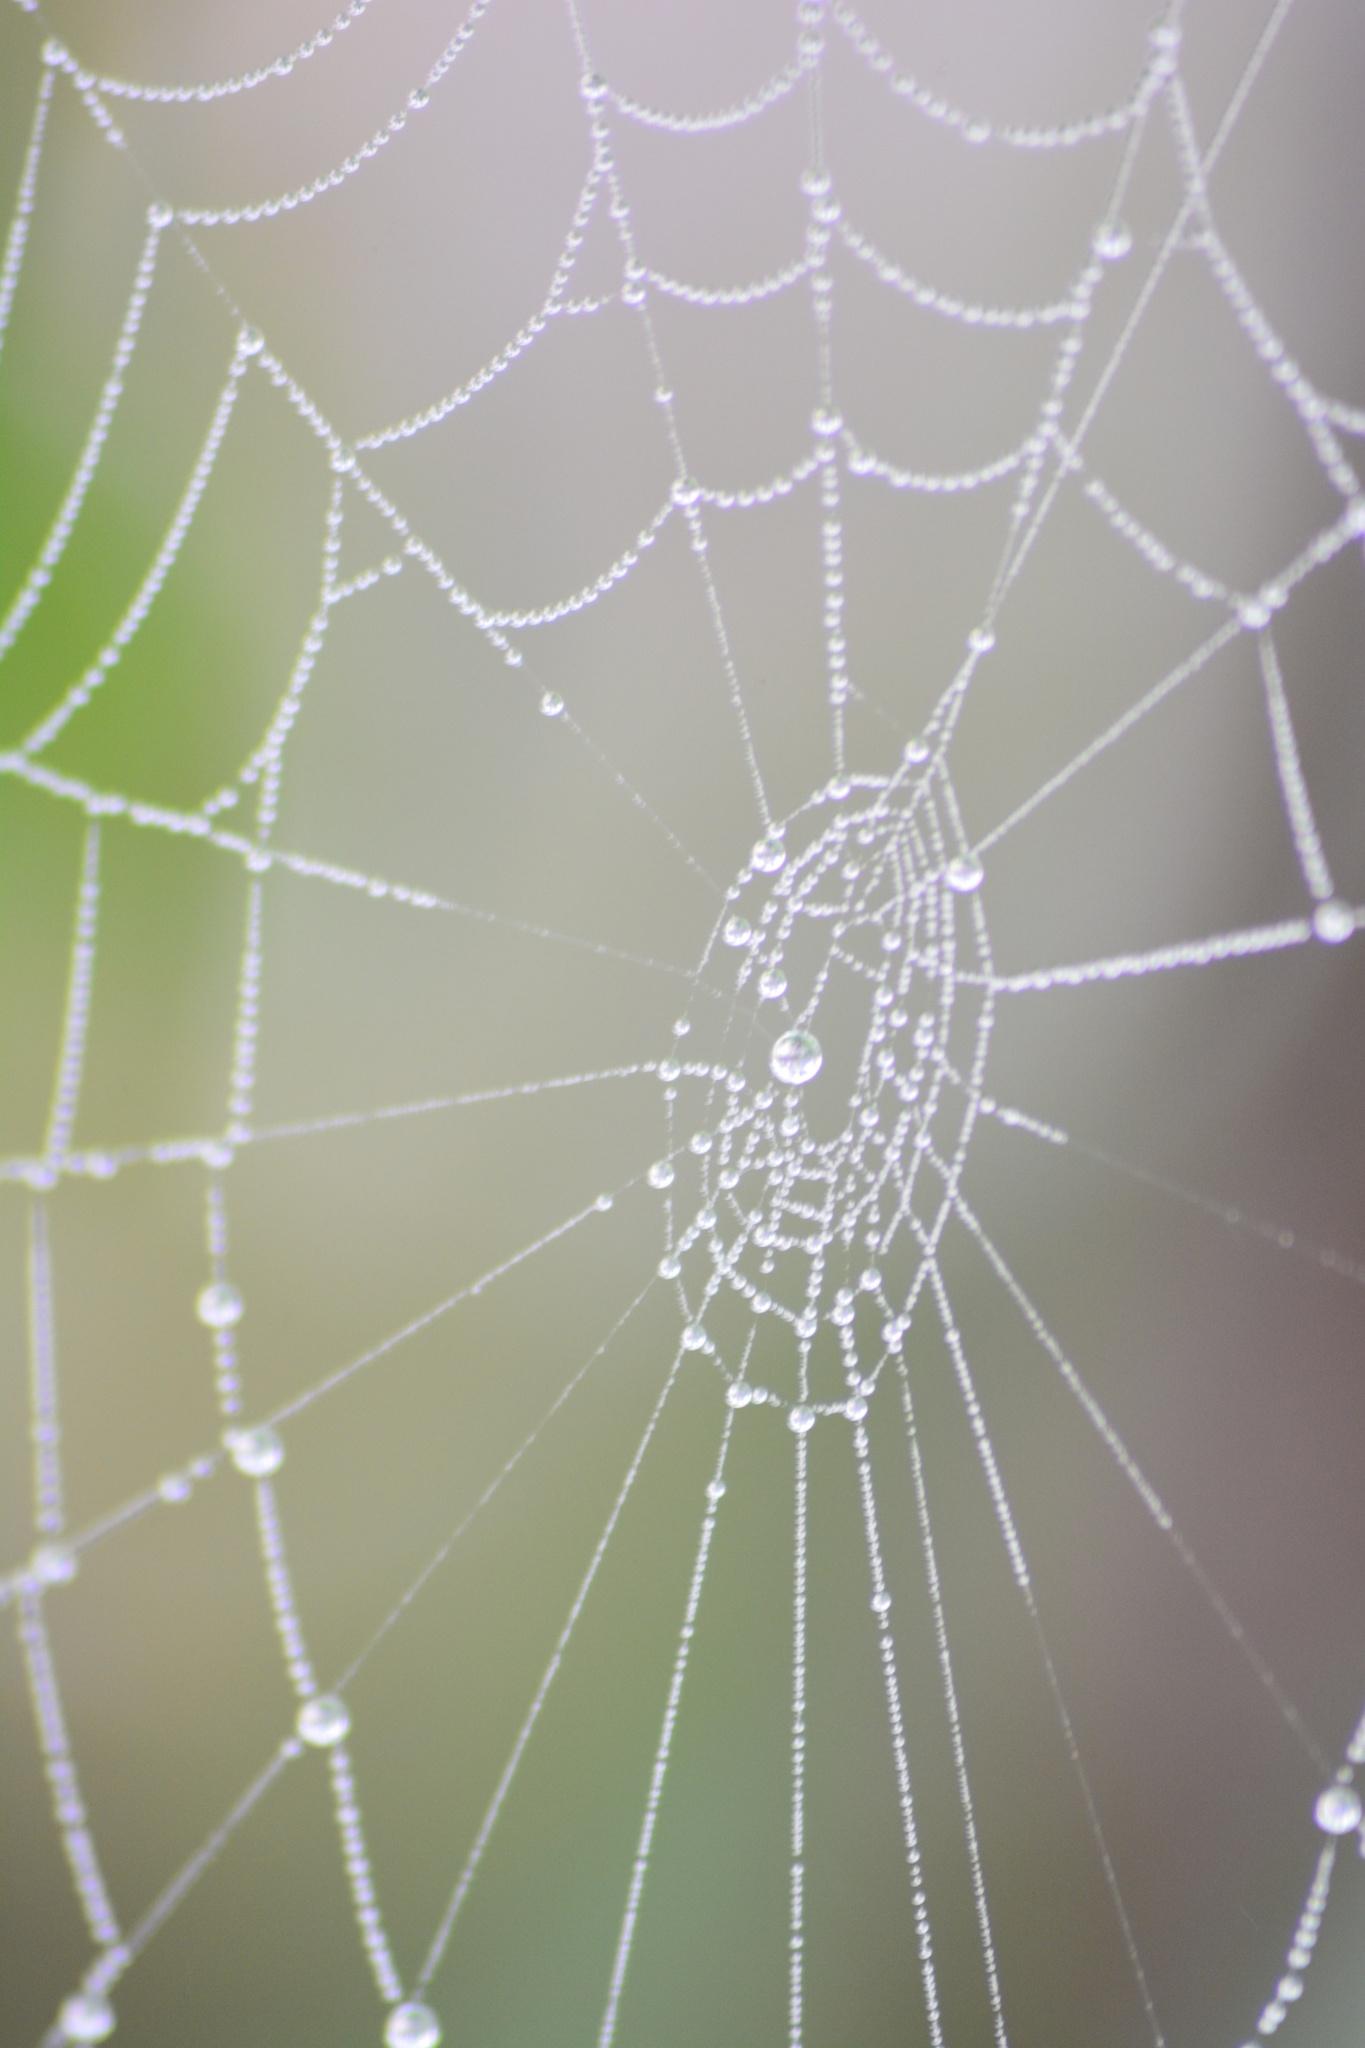 Spidernet by sablar